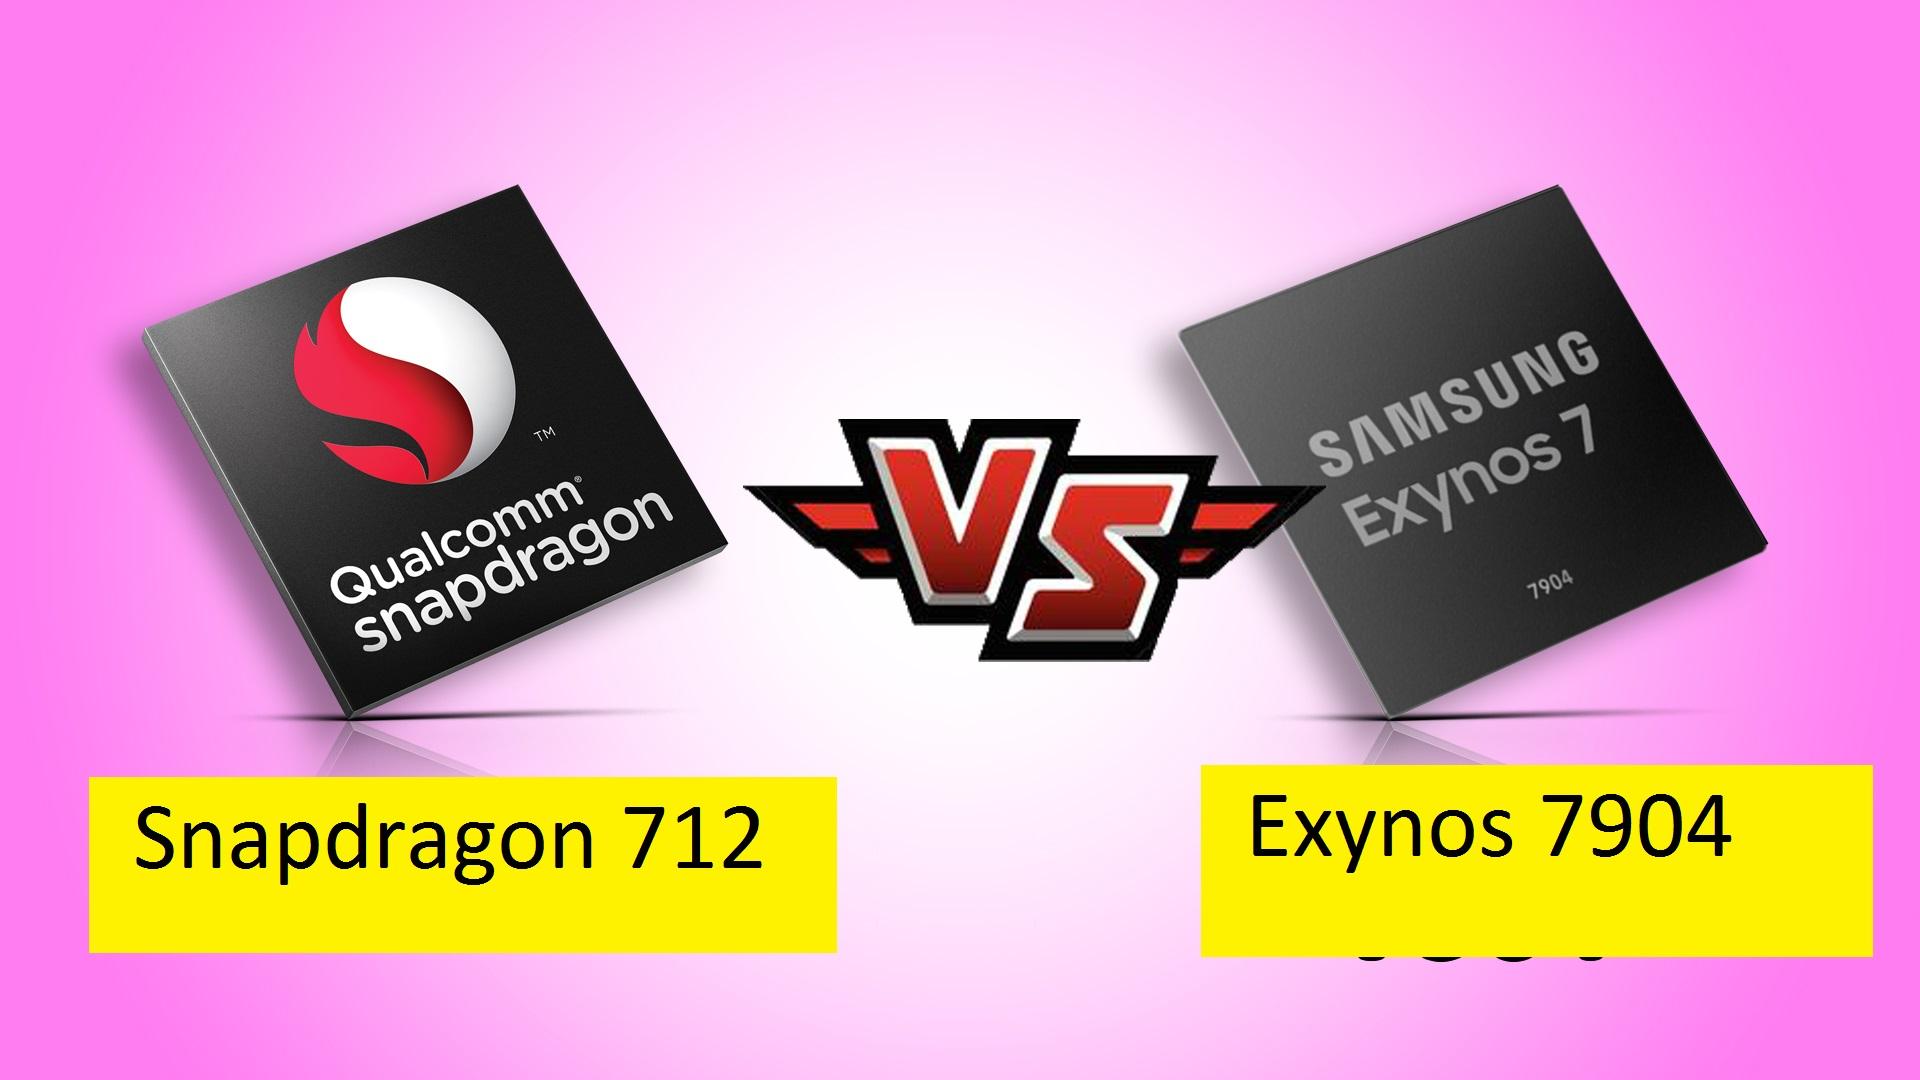 Exynos 7904 Vs Snapdragon 712